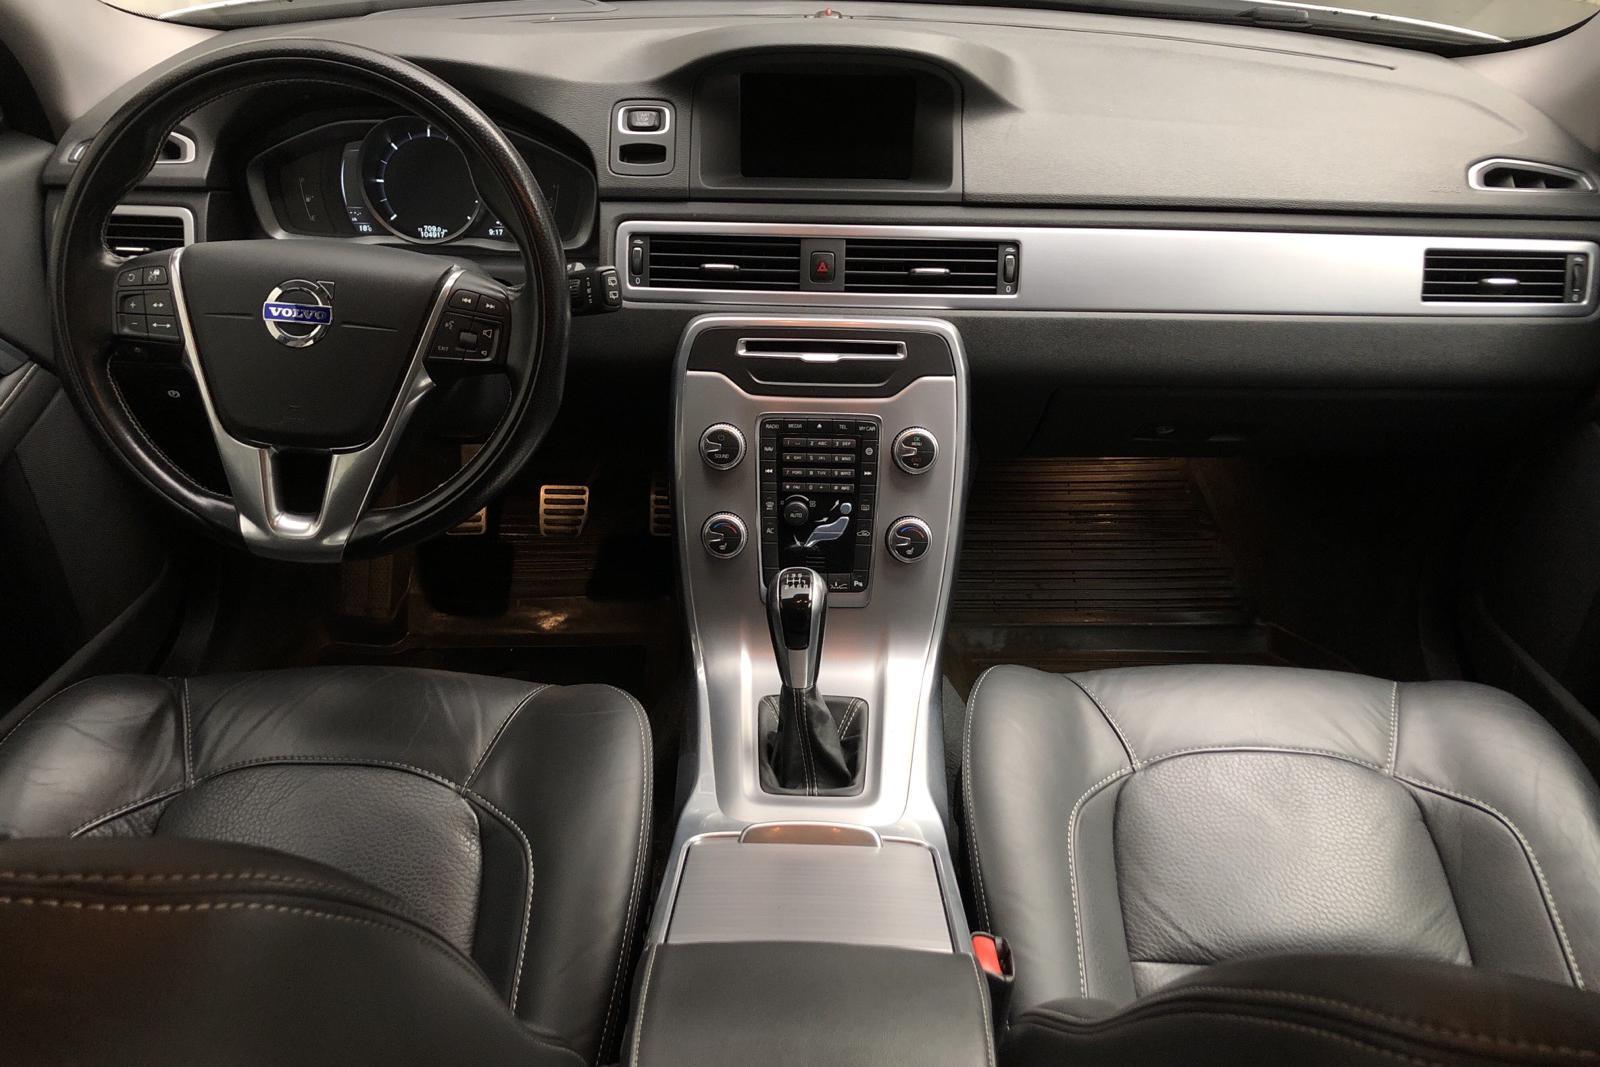 Volvo XC70 II D4 2WD (181hk) - 104 910 km - Manual - white - 2016